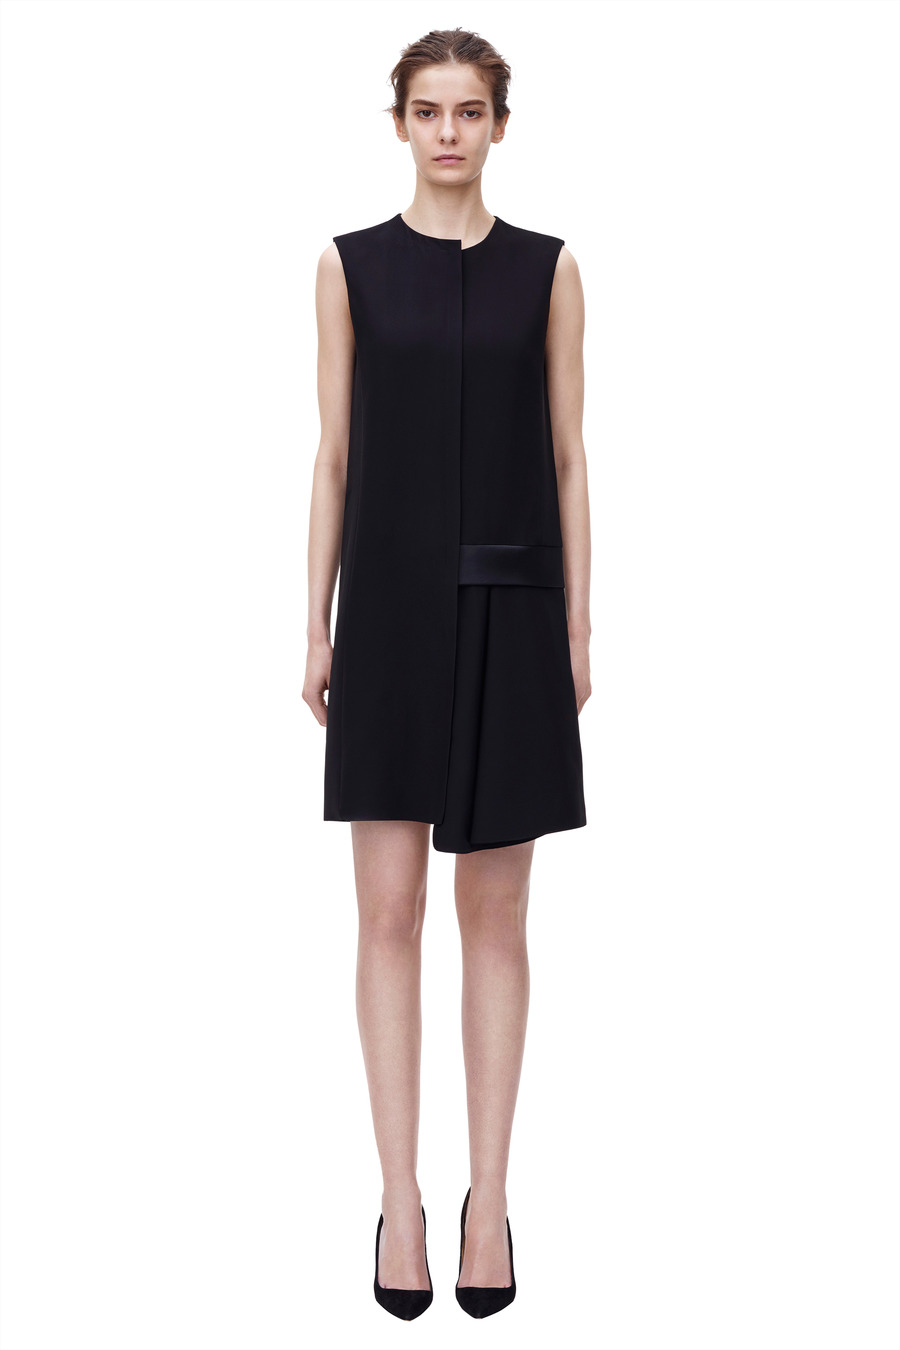 VicBeckham_Dress2